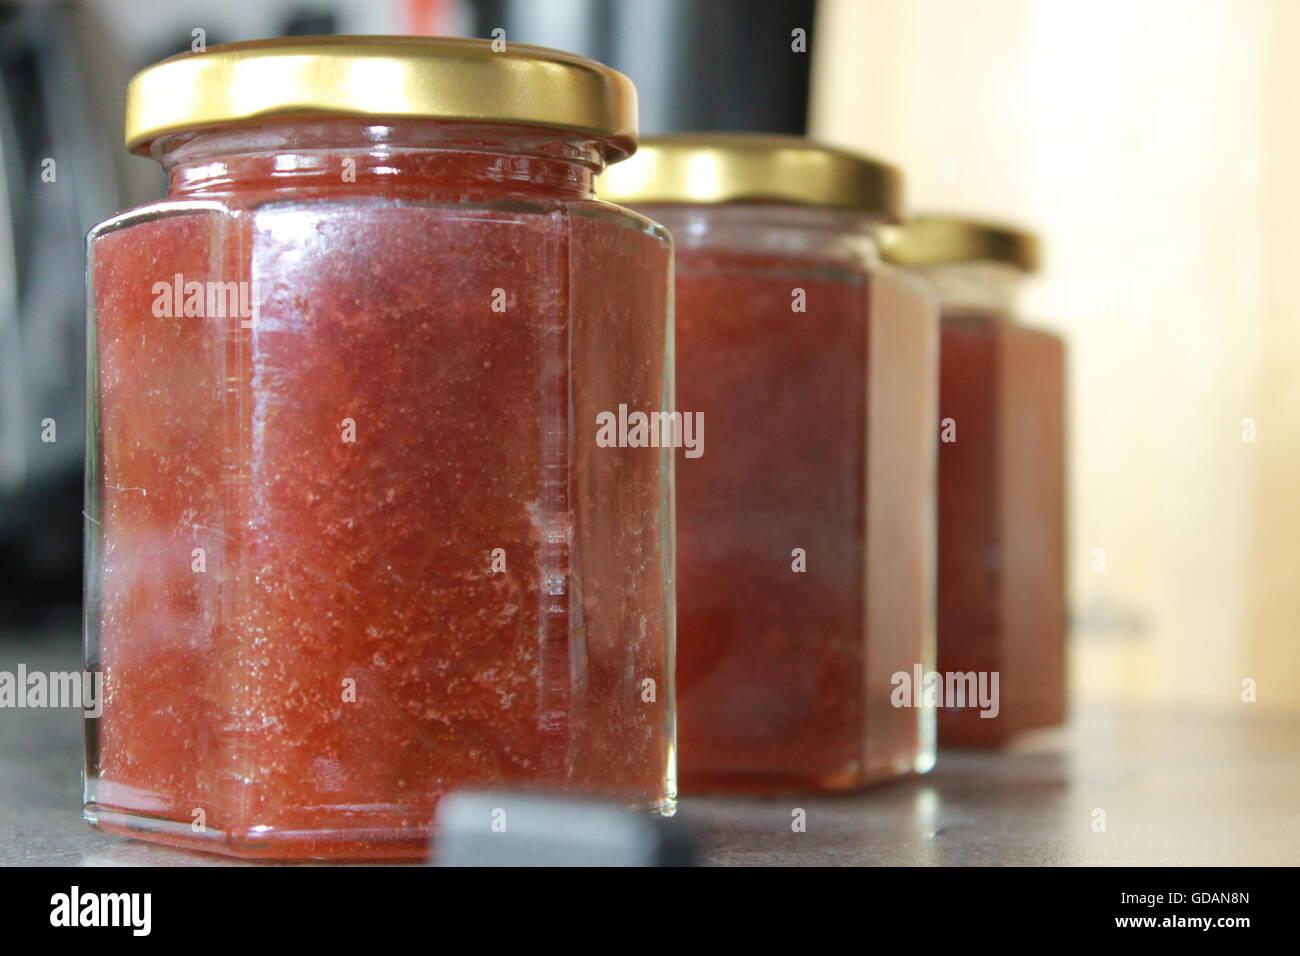 how to make rhubarb jam without pectin